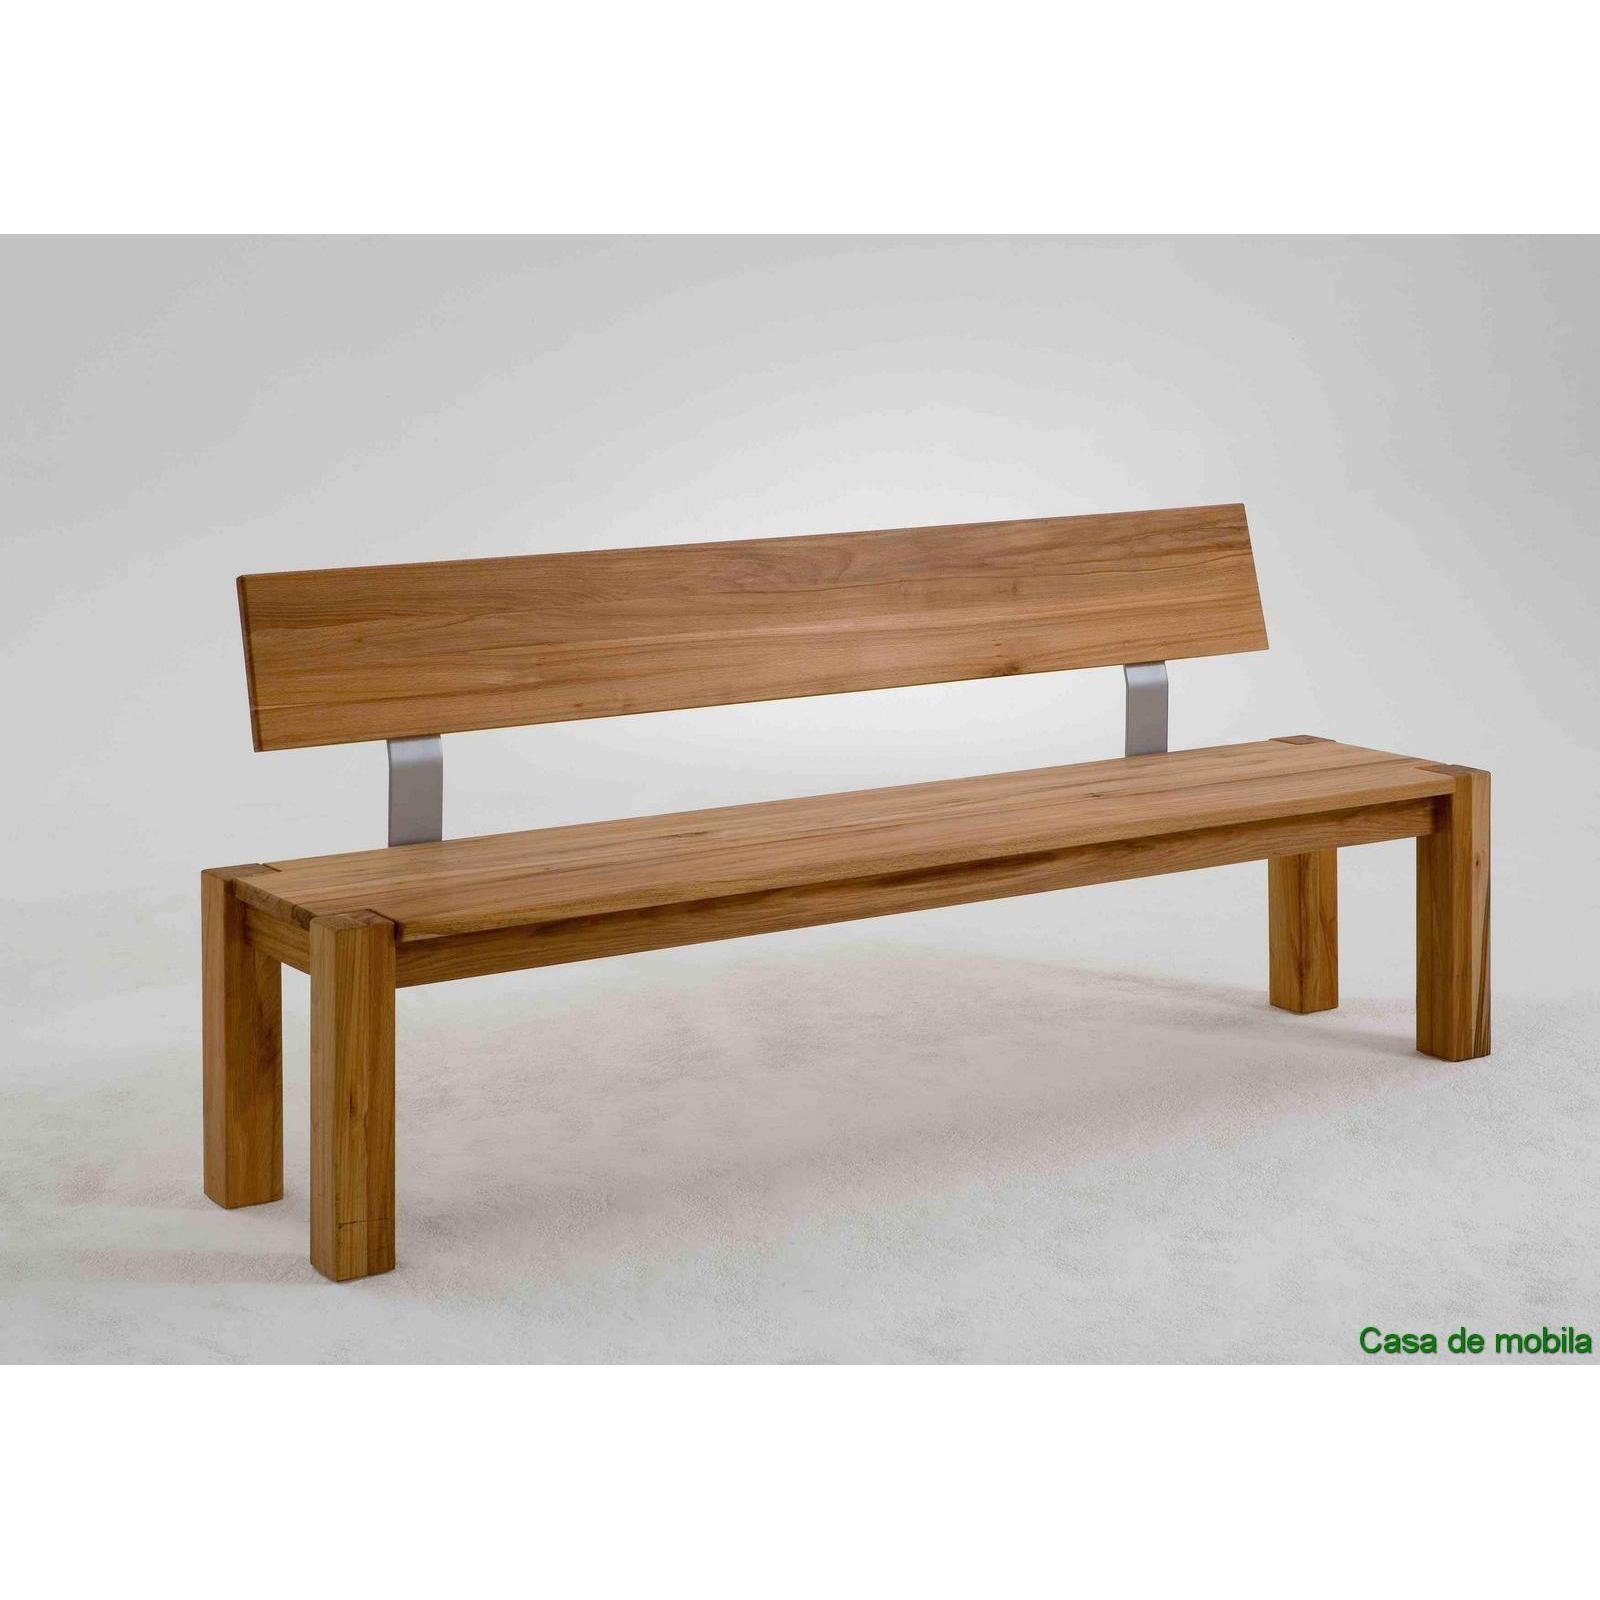 Tolle sitzbank massivholz mit lehne   Sitzbank esszimmer ...